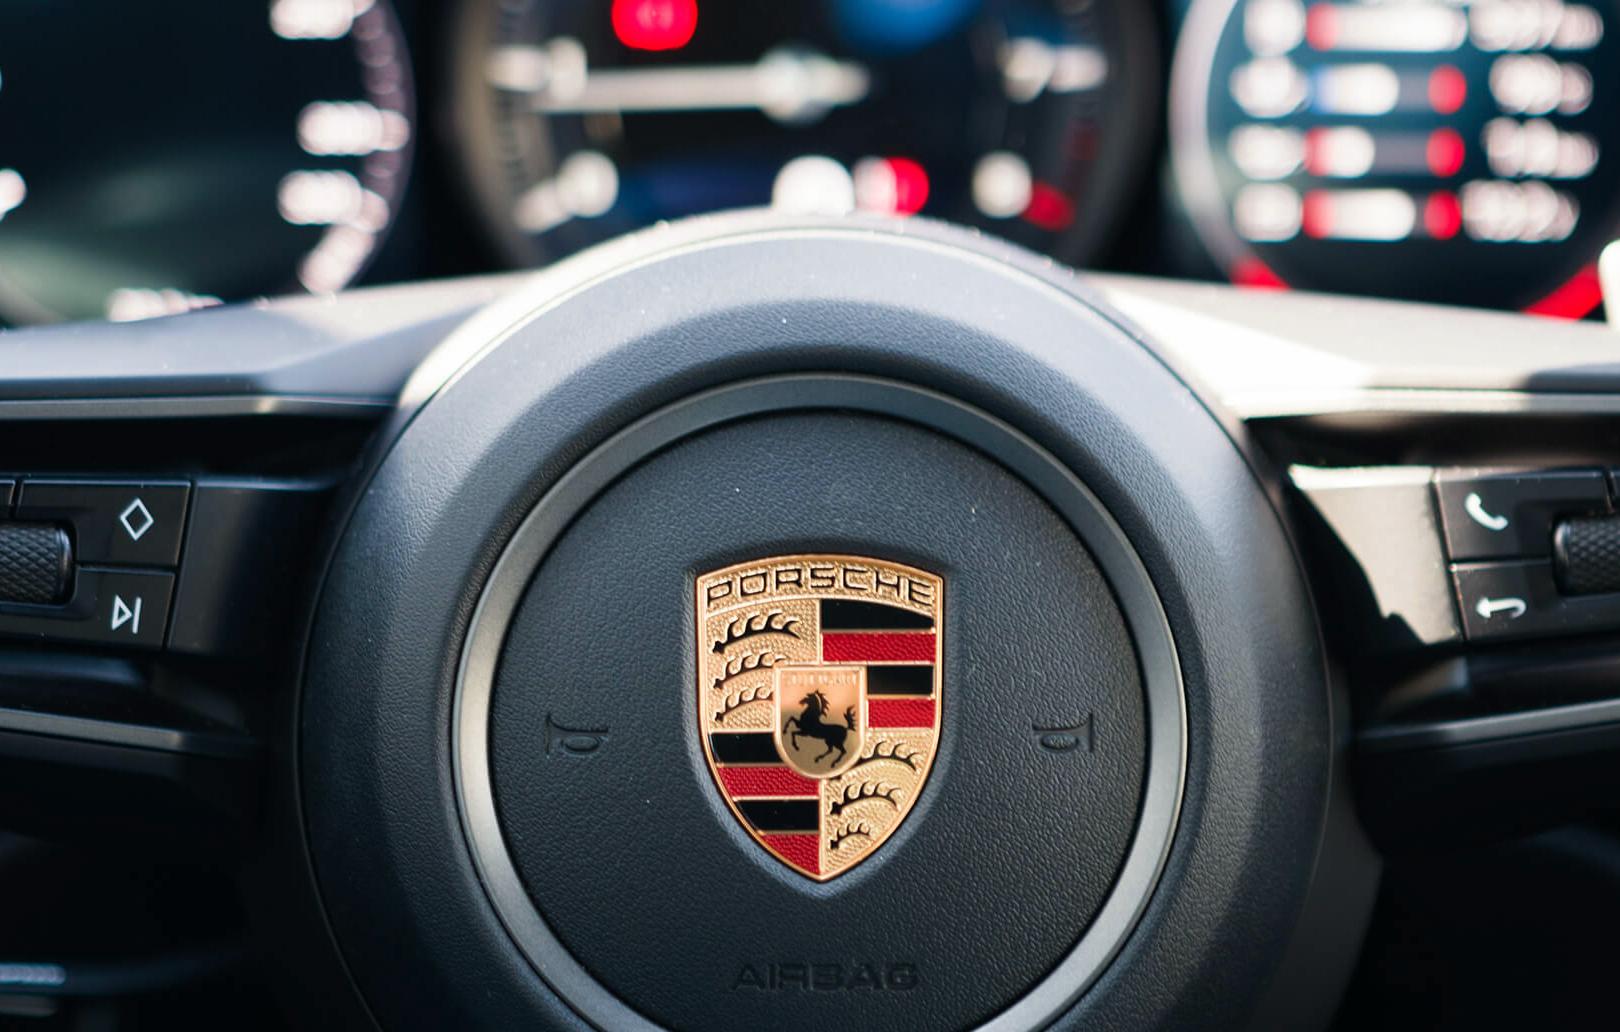 sportwagen-fahren-frankfurt-am-main-bg4